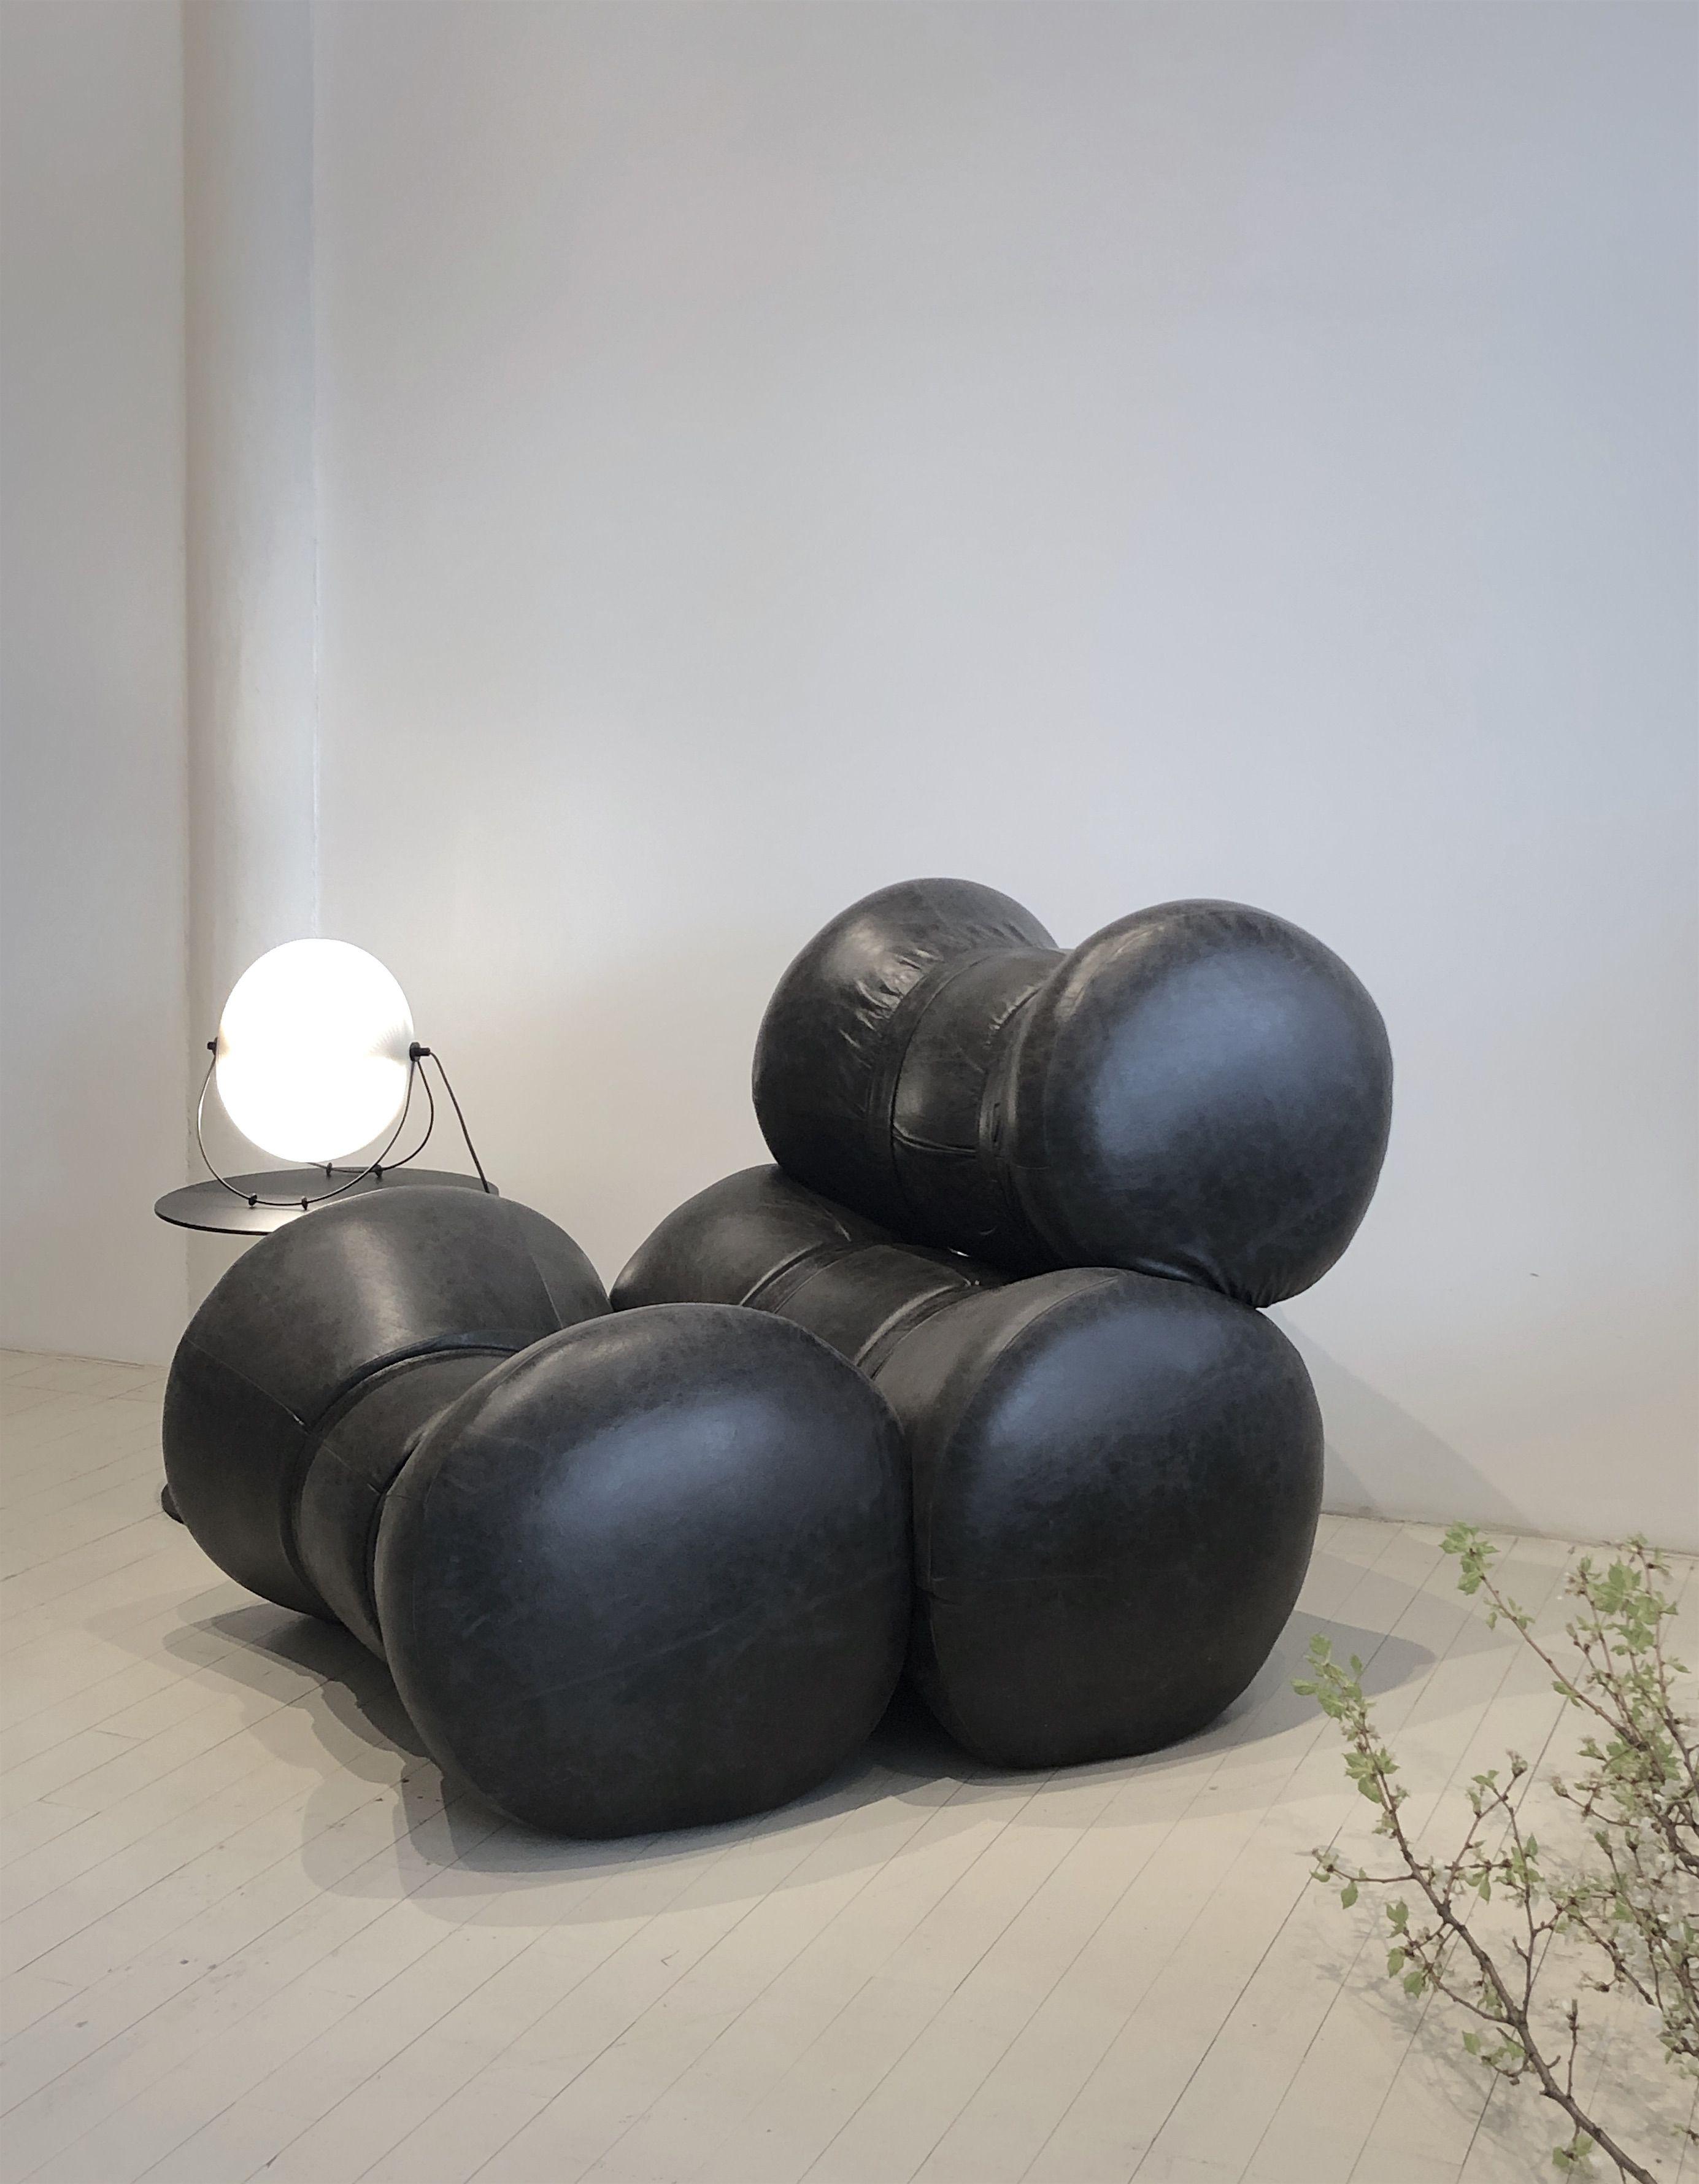 Awe Inspiring Fardos Lounge Chair By Ricardo Fasanello Midcentury Modern Unemploymentrelief Wooden Chair Designs For Living Room Unemploymentrelieforg